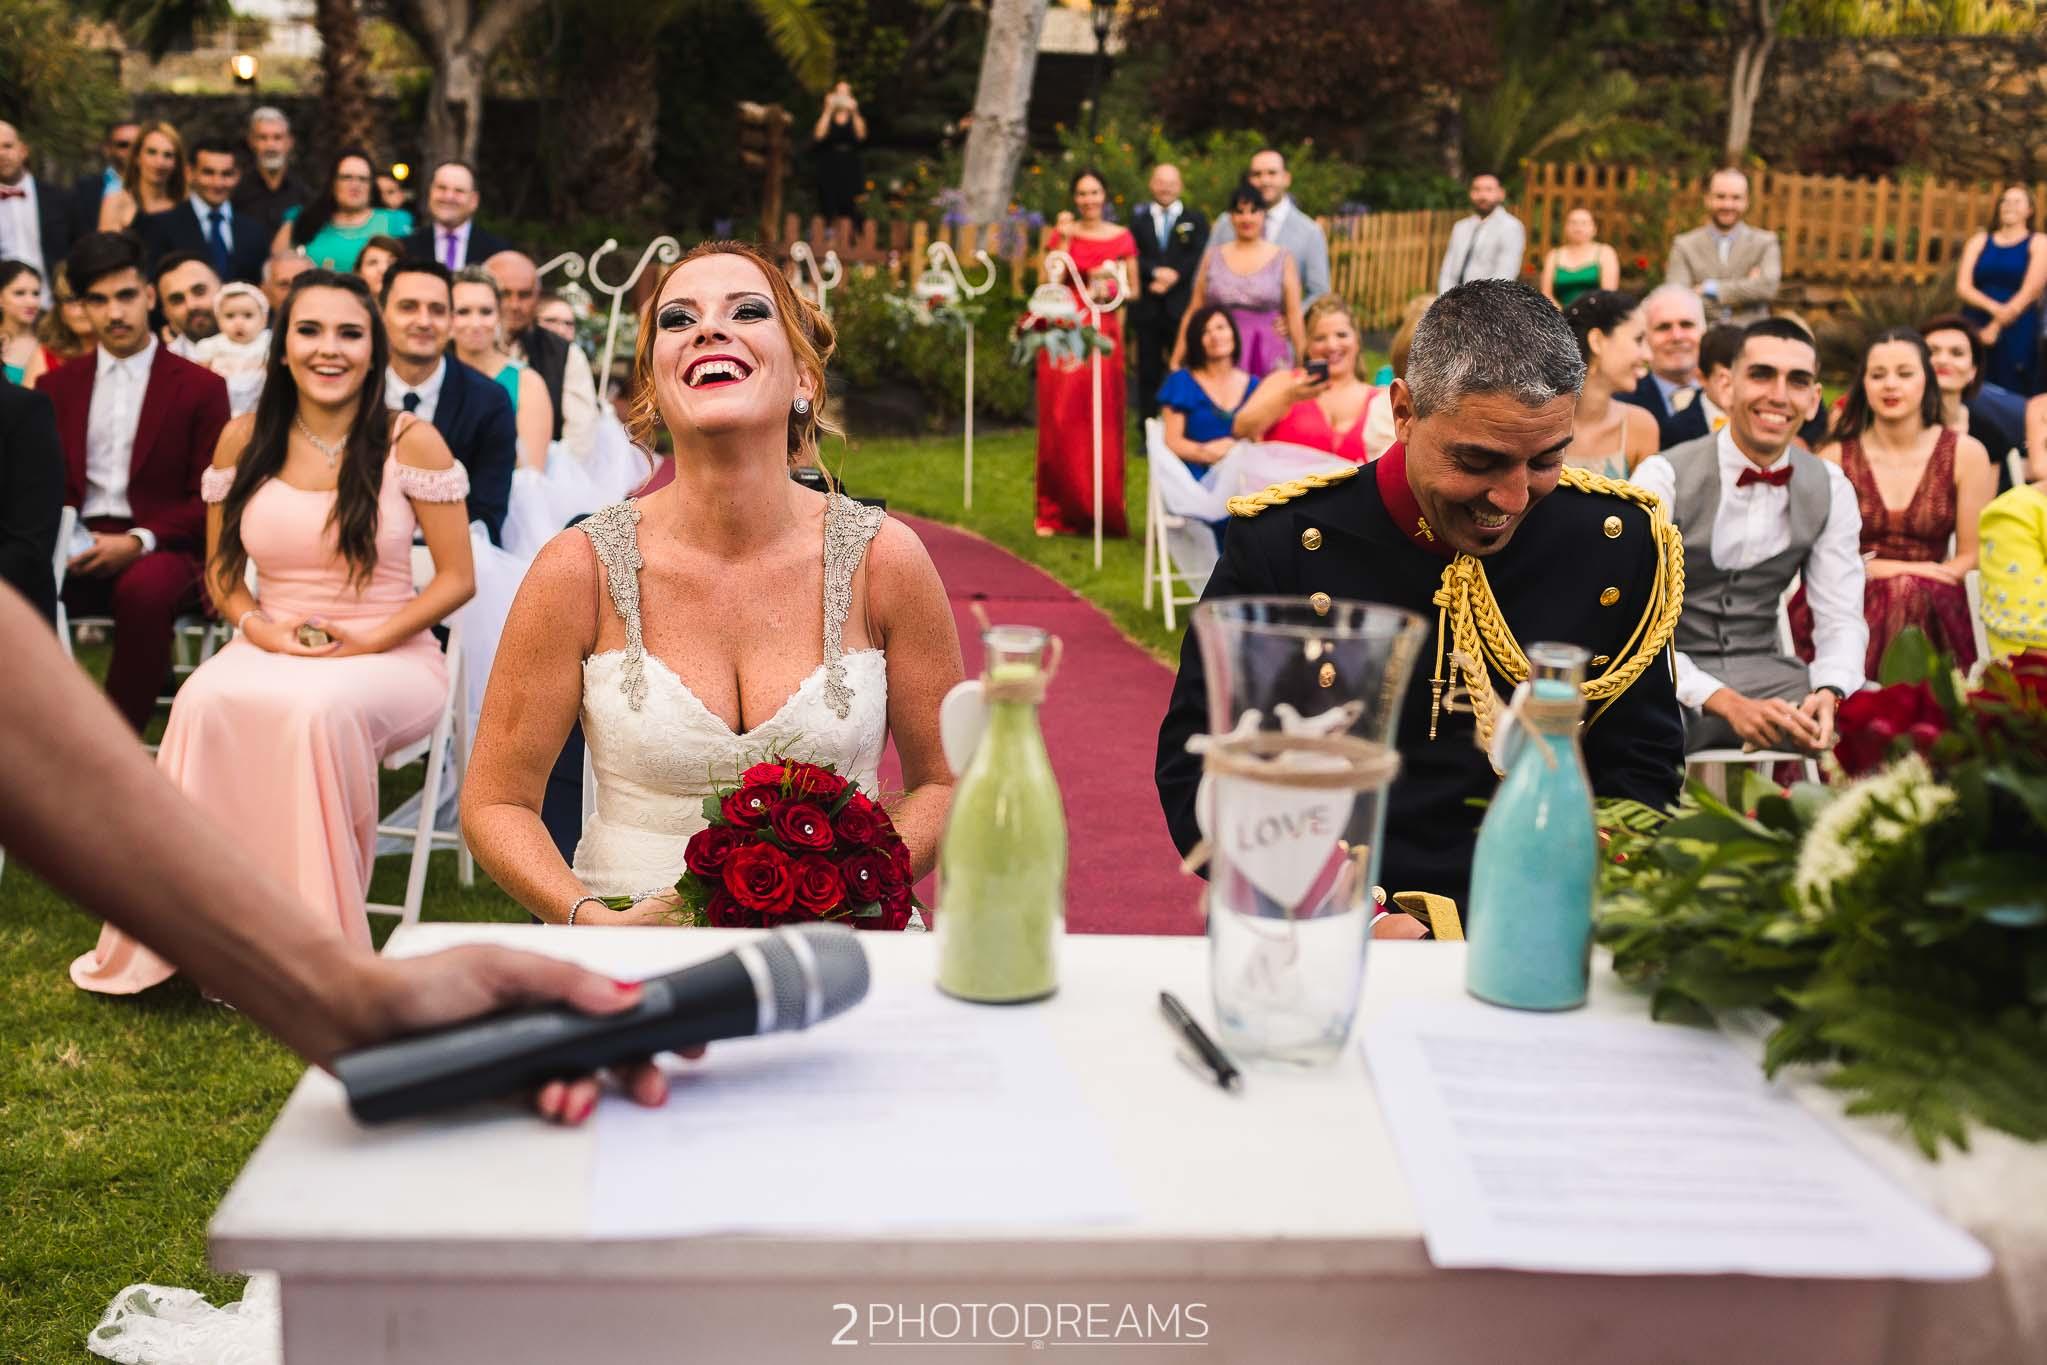 Wedding photographer Lincolnshire Yorkshire